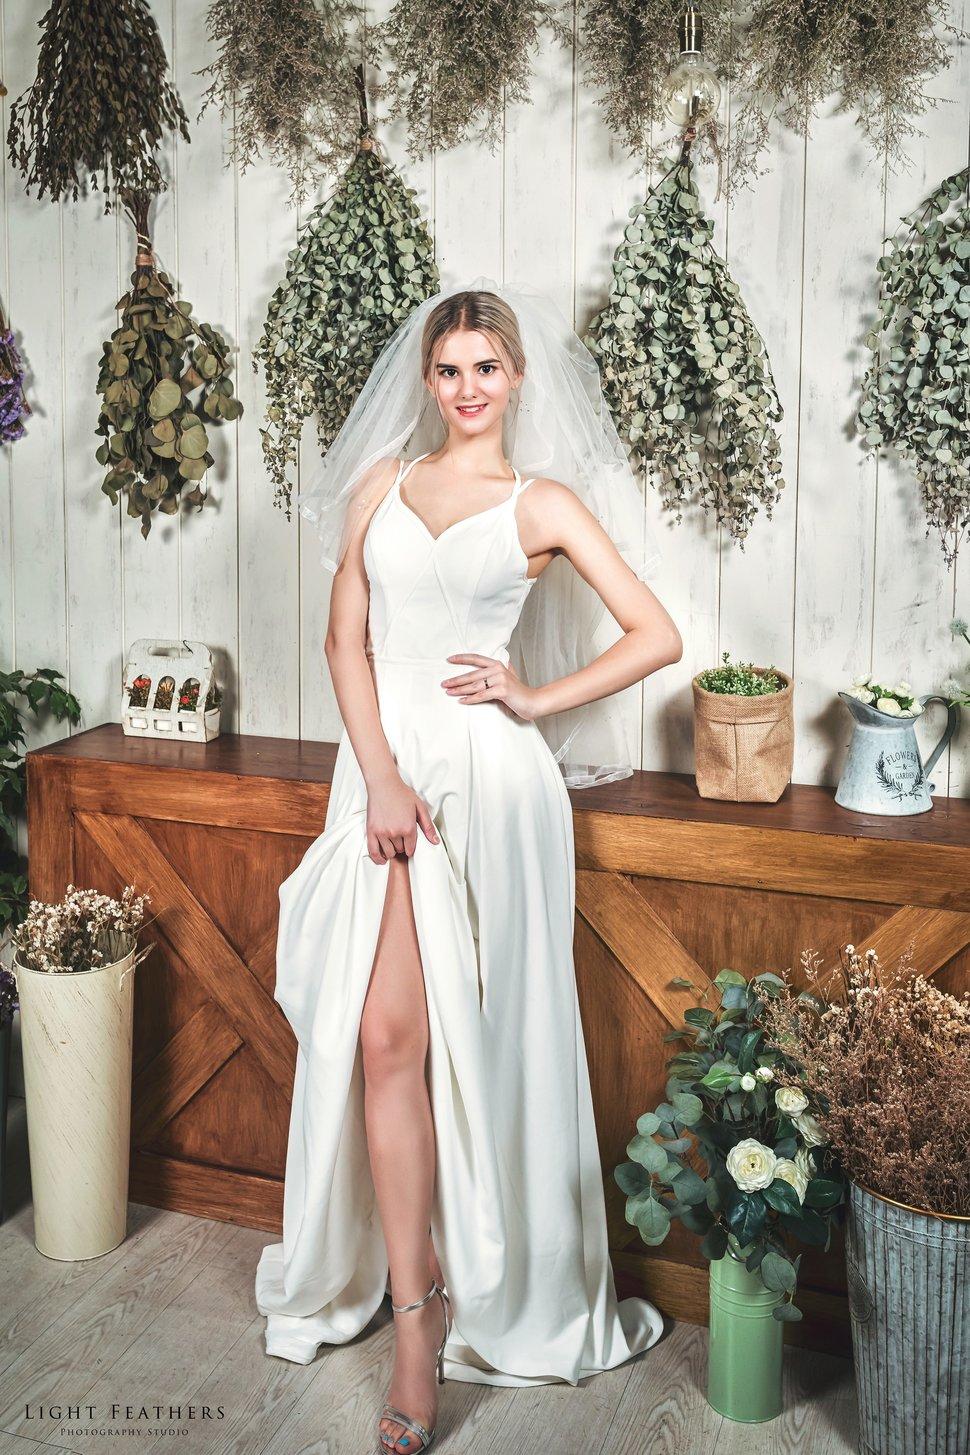 5D4_0401 - Promaker婚禮紀錄攝影團隊婚攝豪哥《結婚吧》